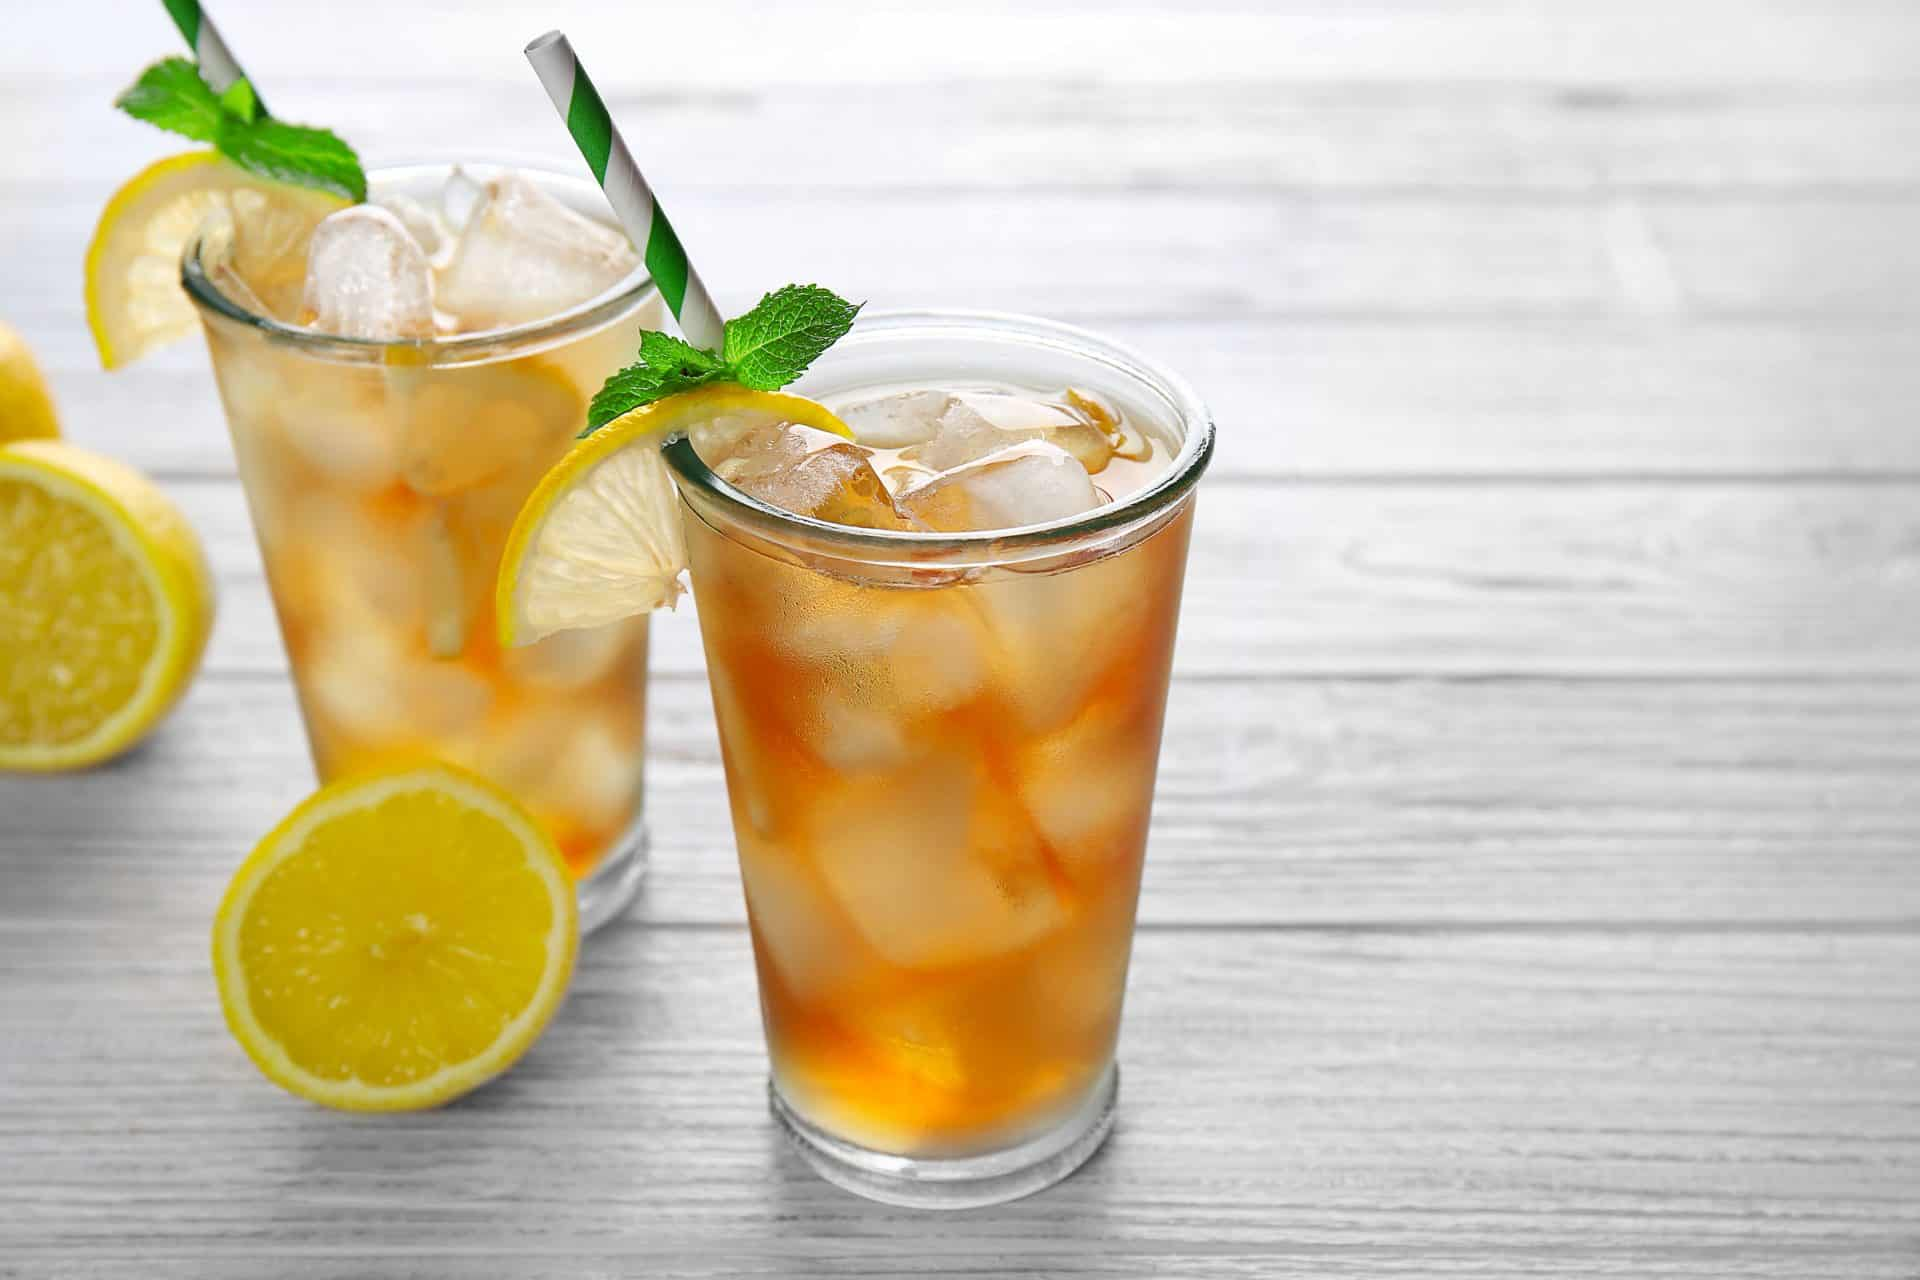 Confira 5 receitas de drinks com chá deliciosos